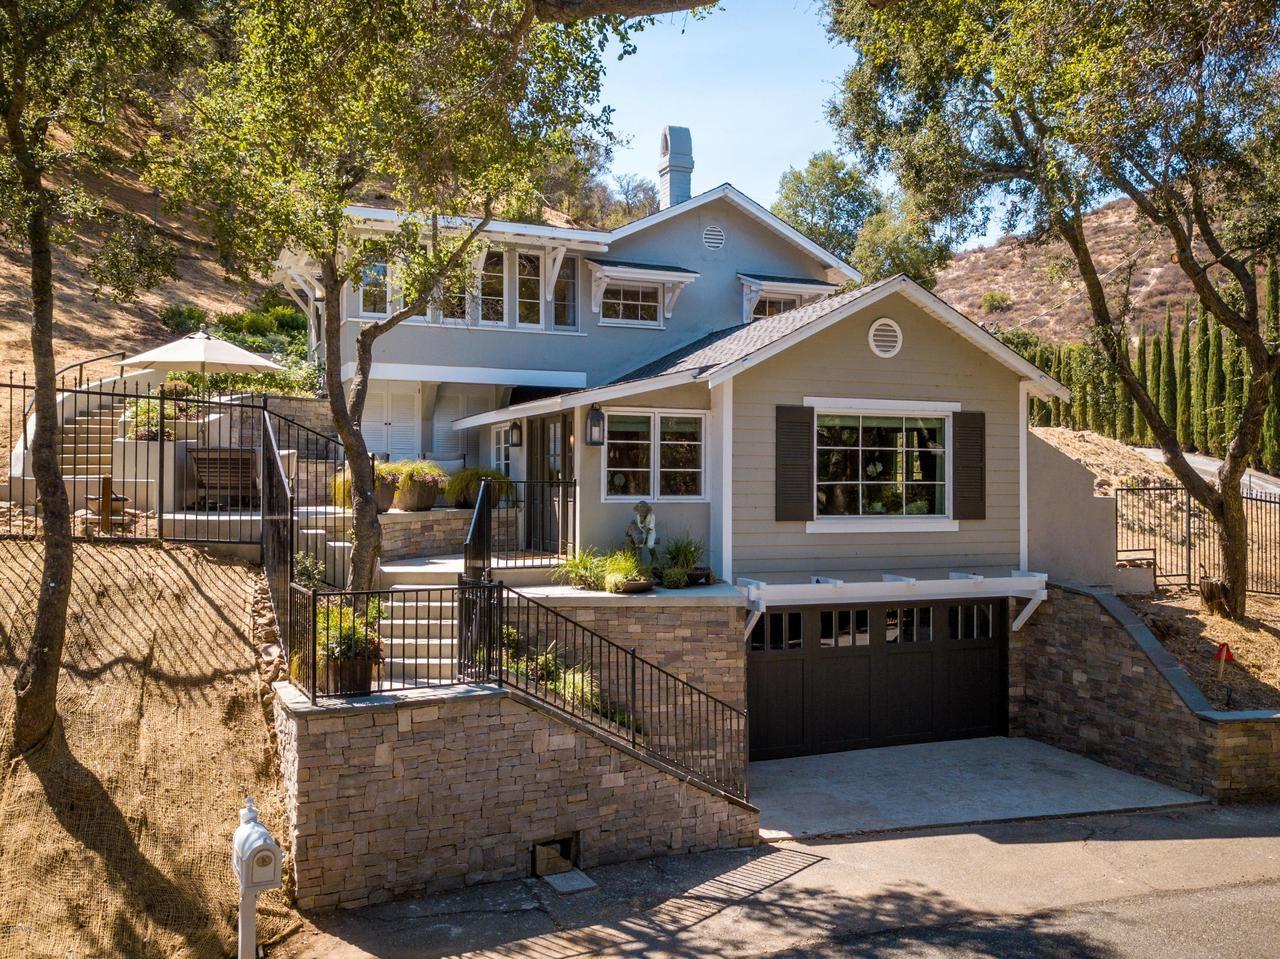 181 LAKE SHERWOOD Drive, Lake Sherwood, CA 91361 - #: 219014118